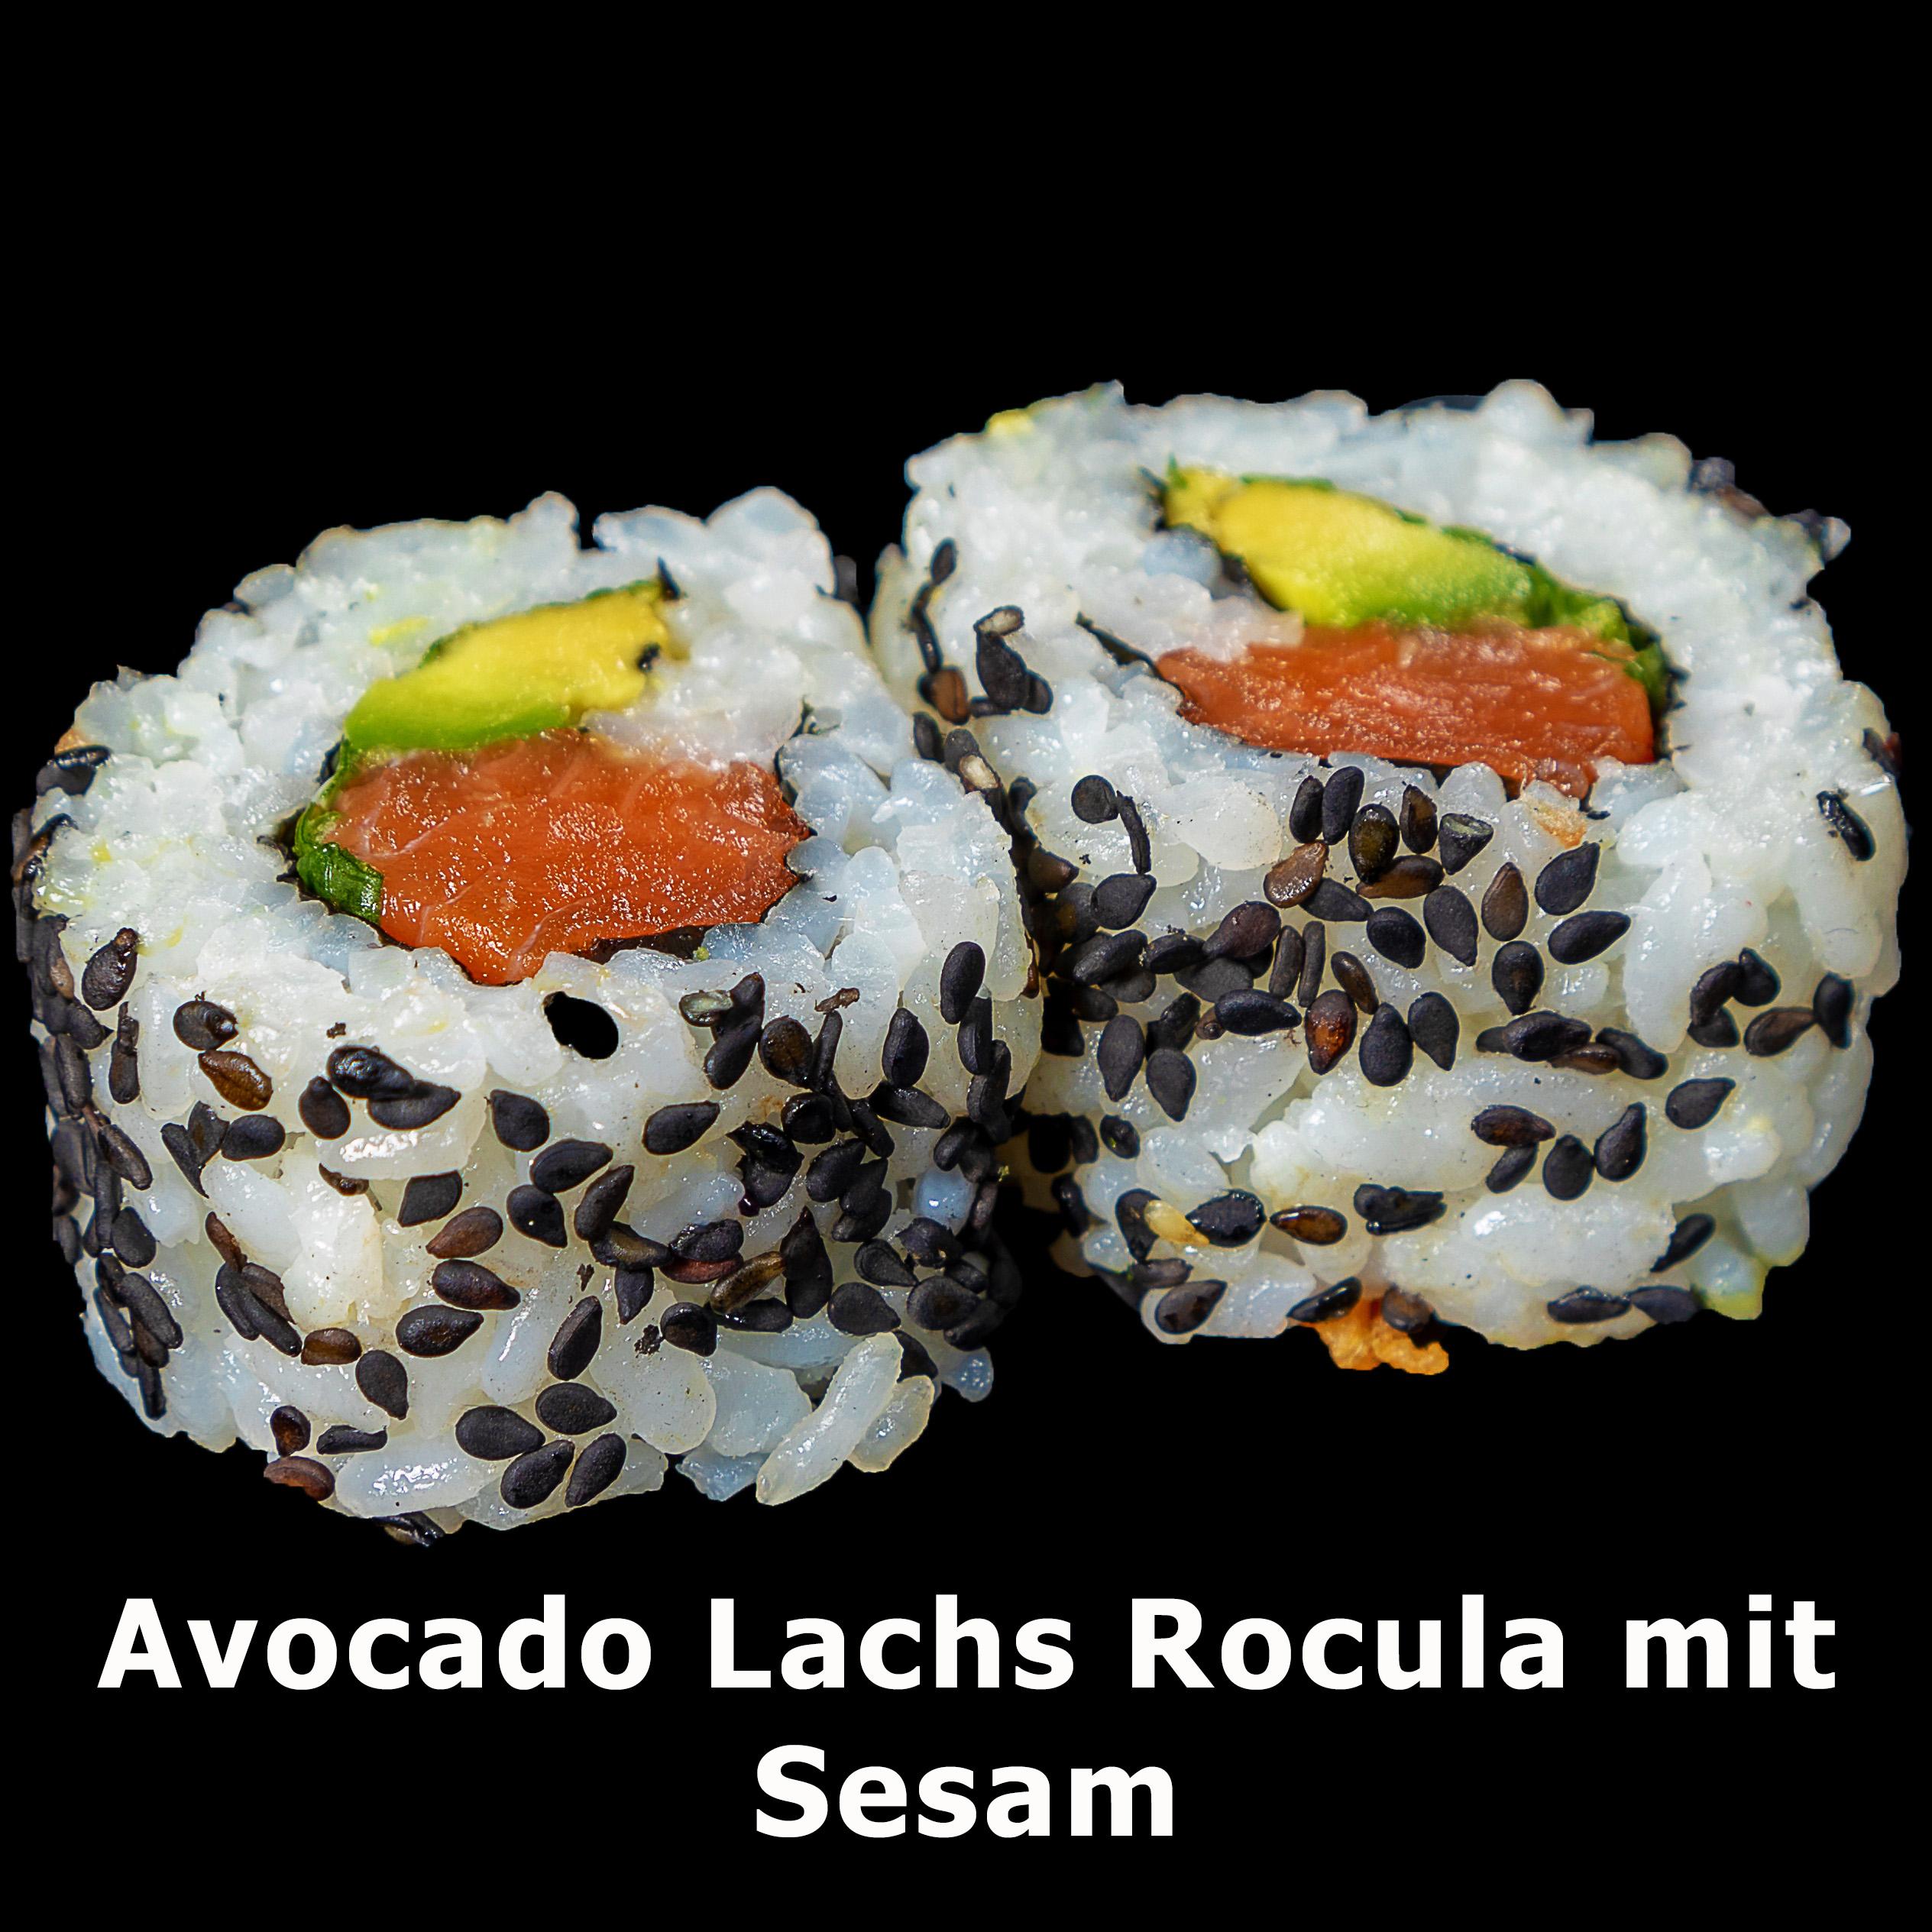 40. Avocado Lachs Rocula mit Sesam